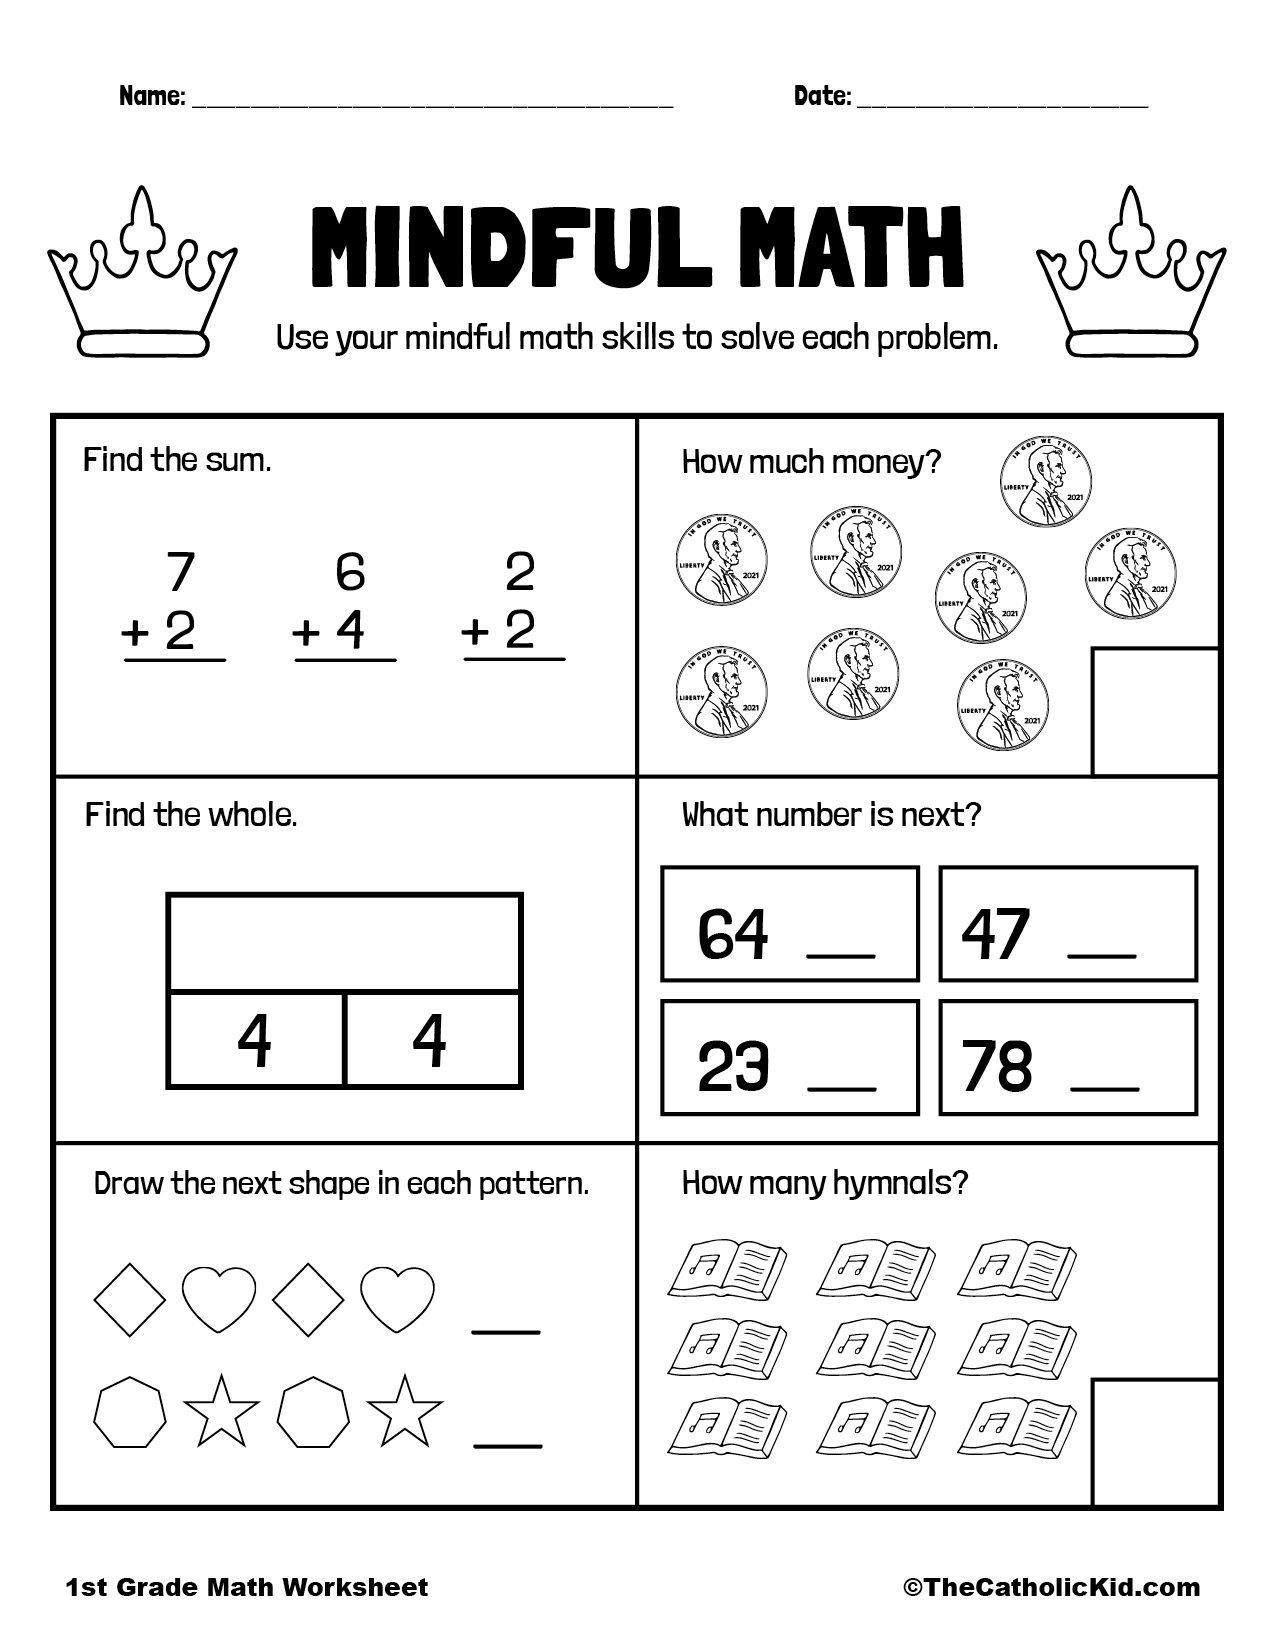 Mental Math Problems - 1st Grade Math Worksheet Catholic